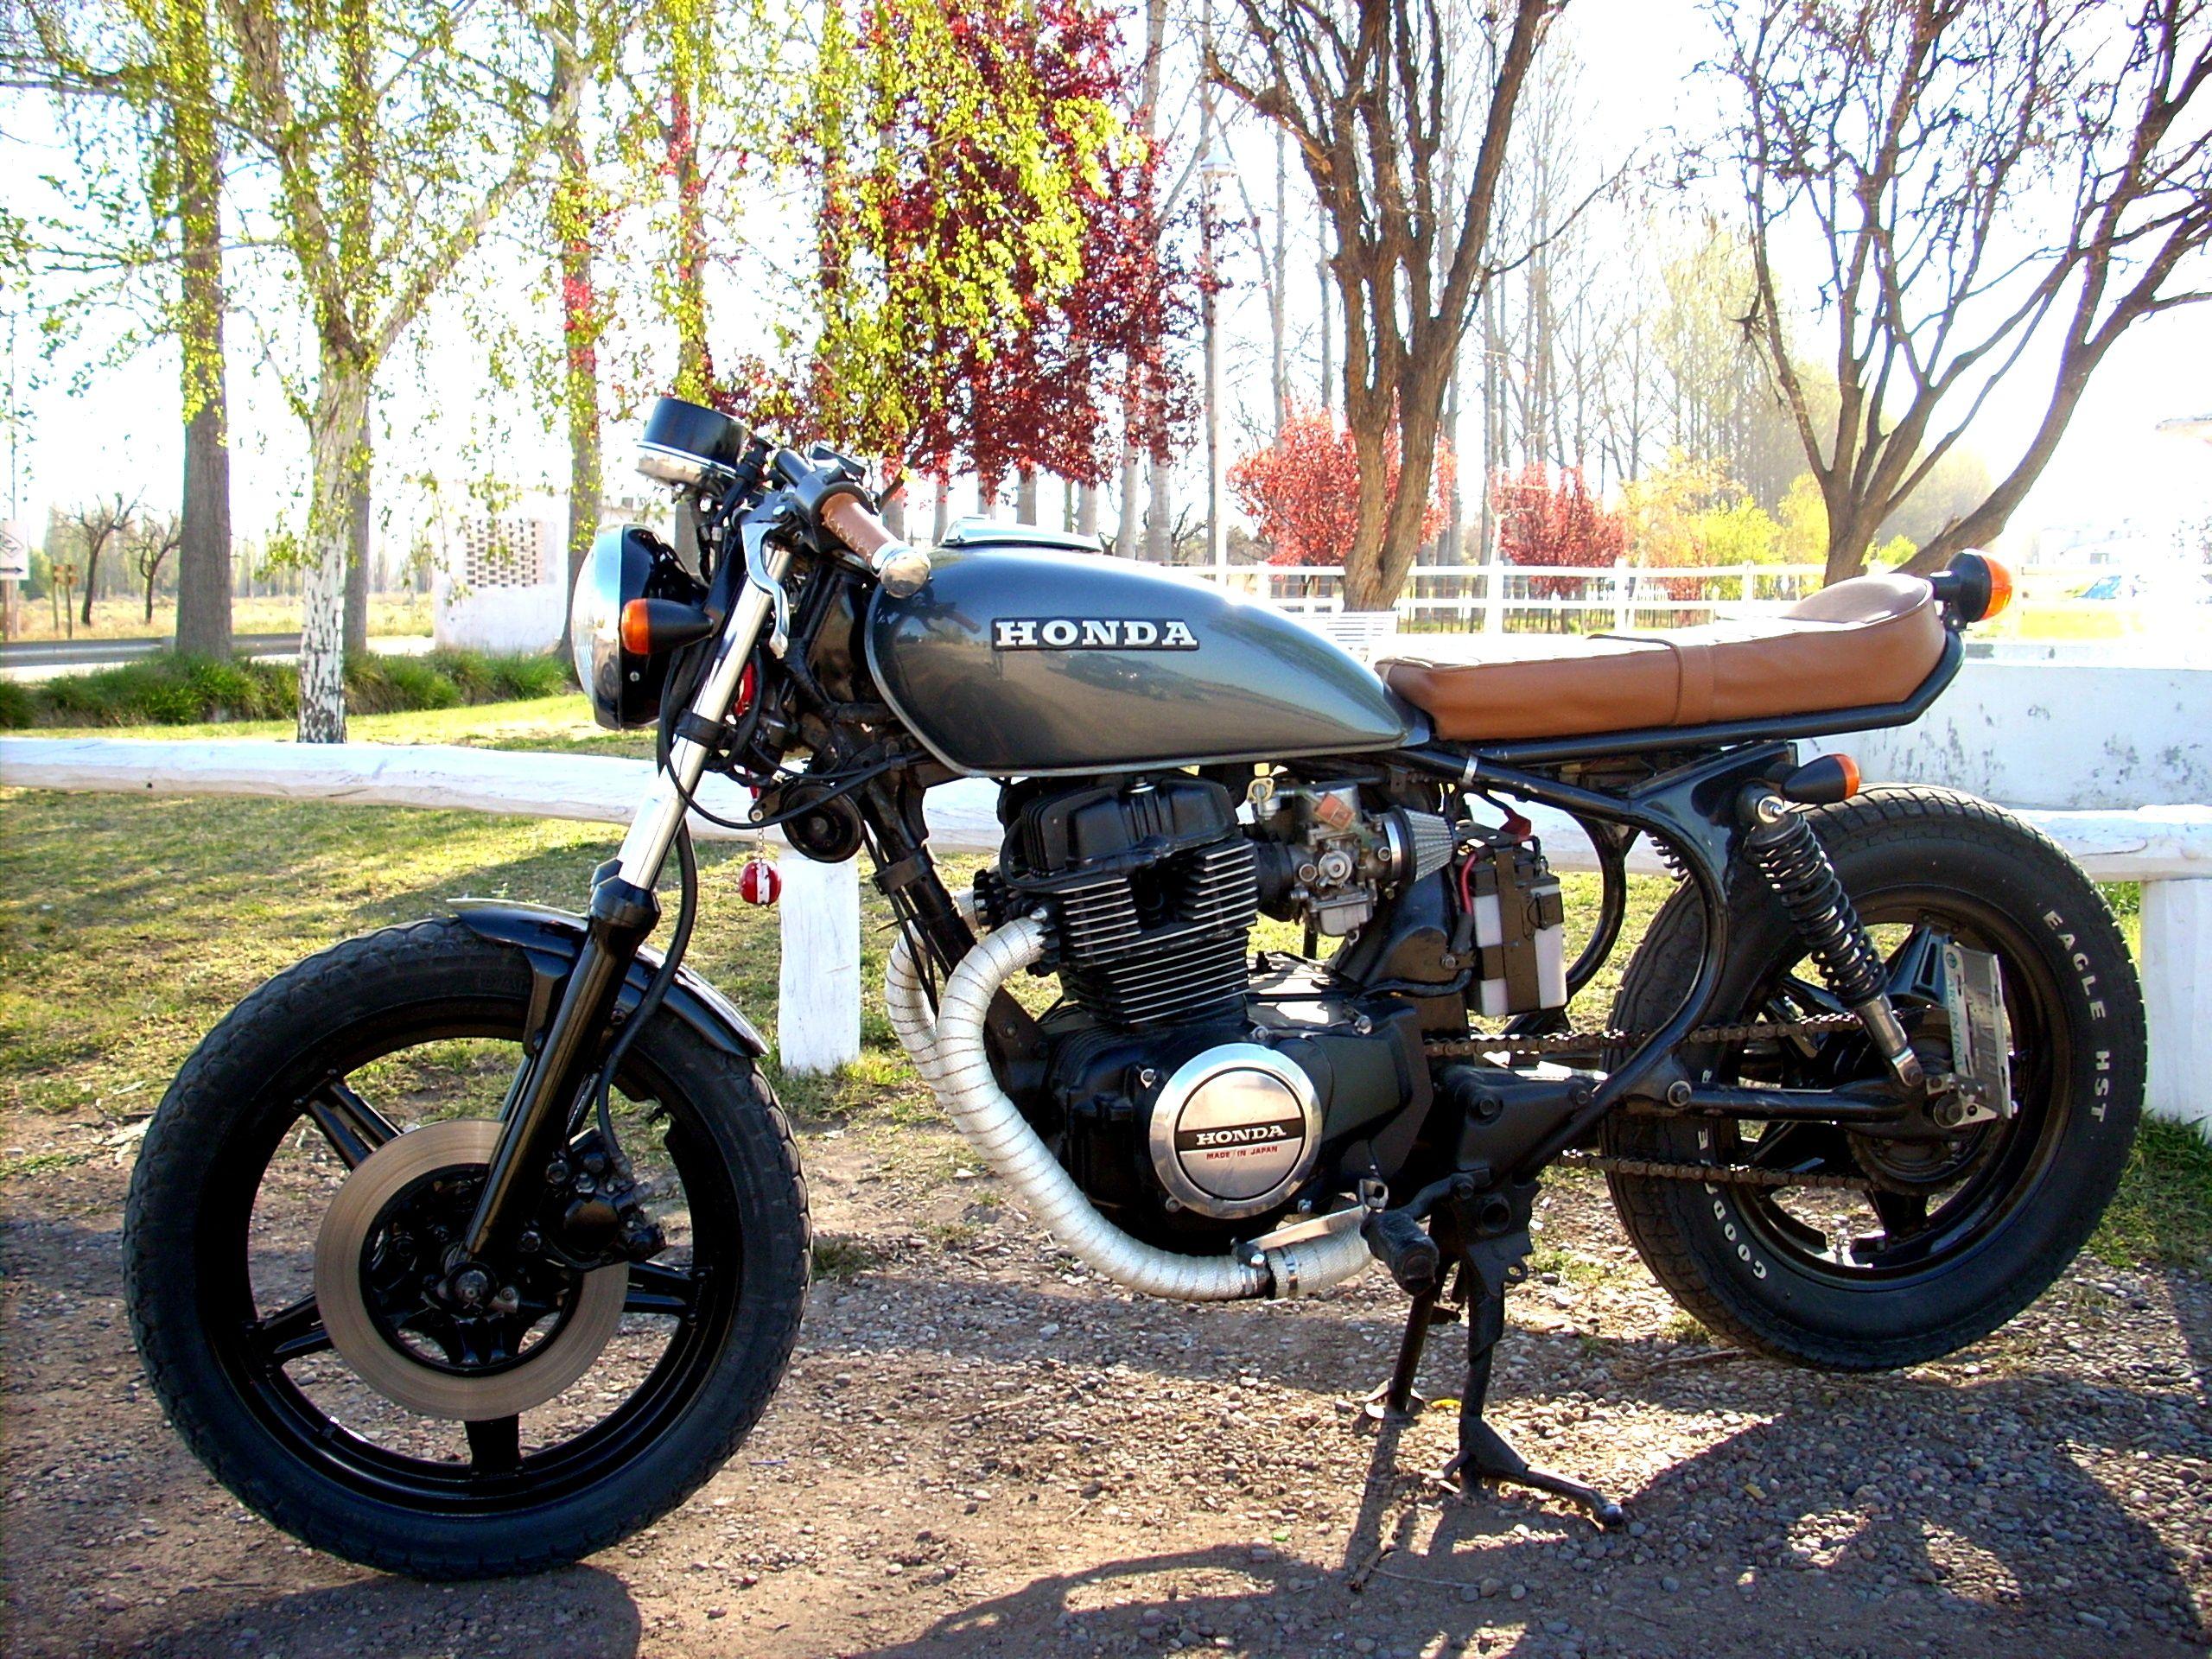 Cm 400 Brat Style Cafe Racer Motorcycle Cafe Racer Bikes Cafe Bike [ 1920 x 2560 Pixel ]